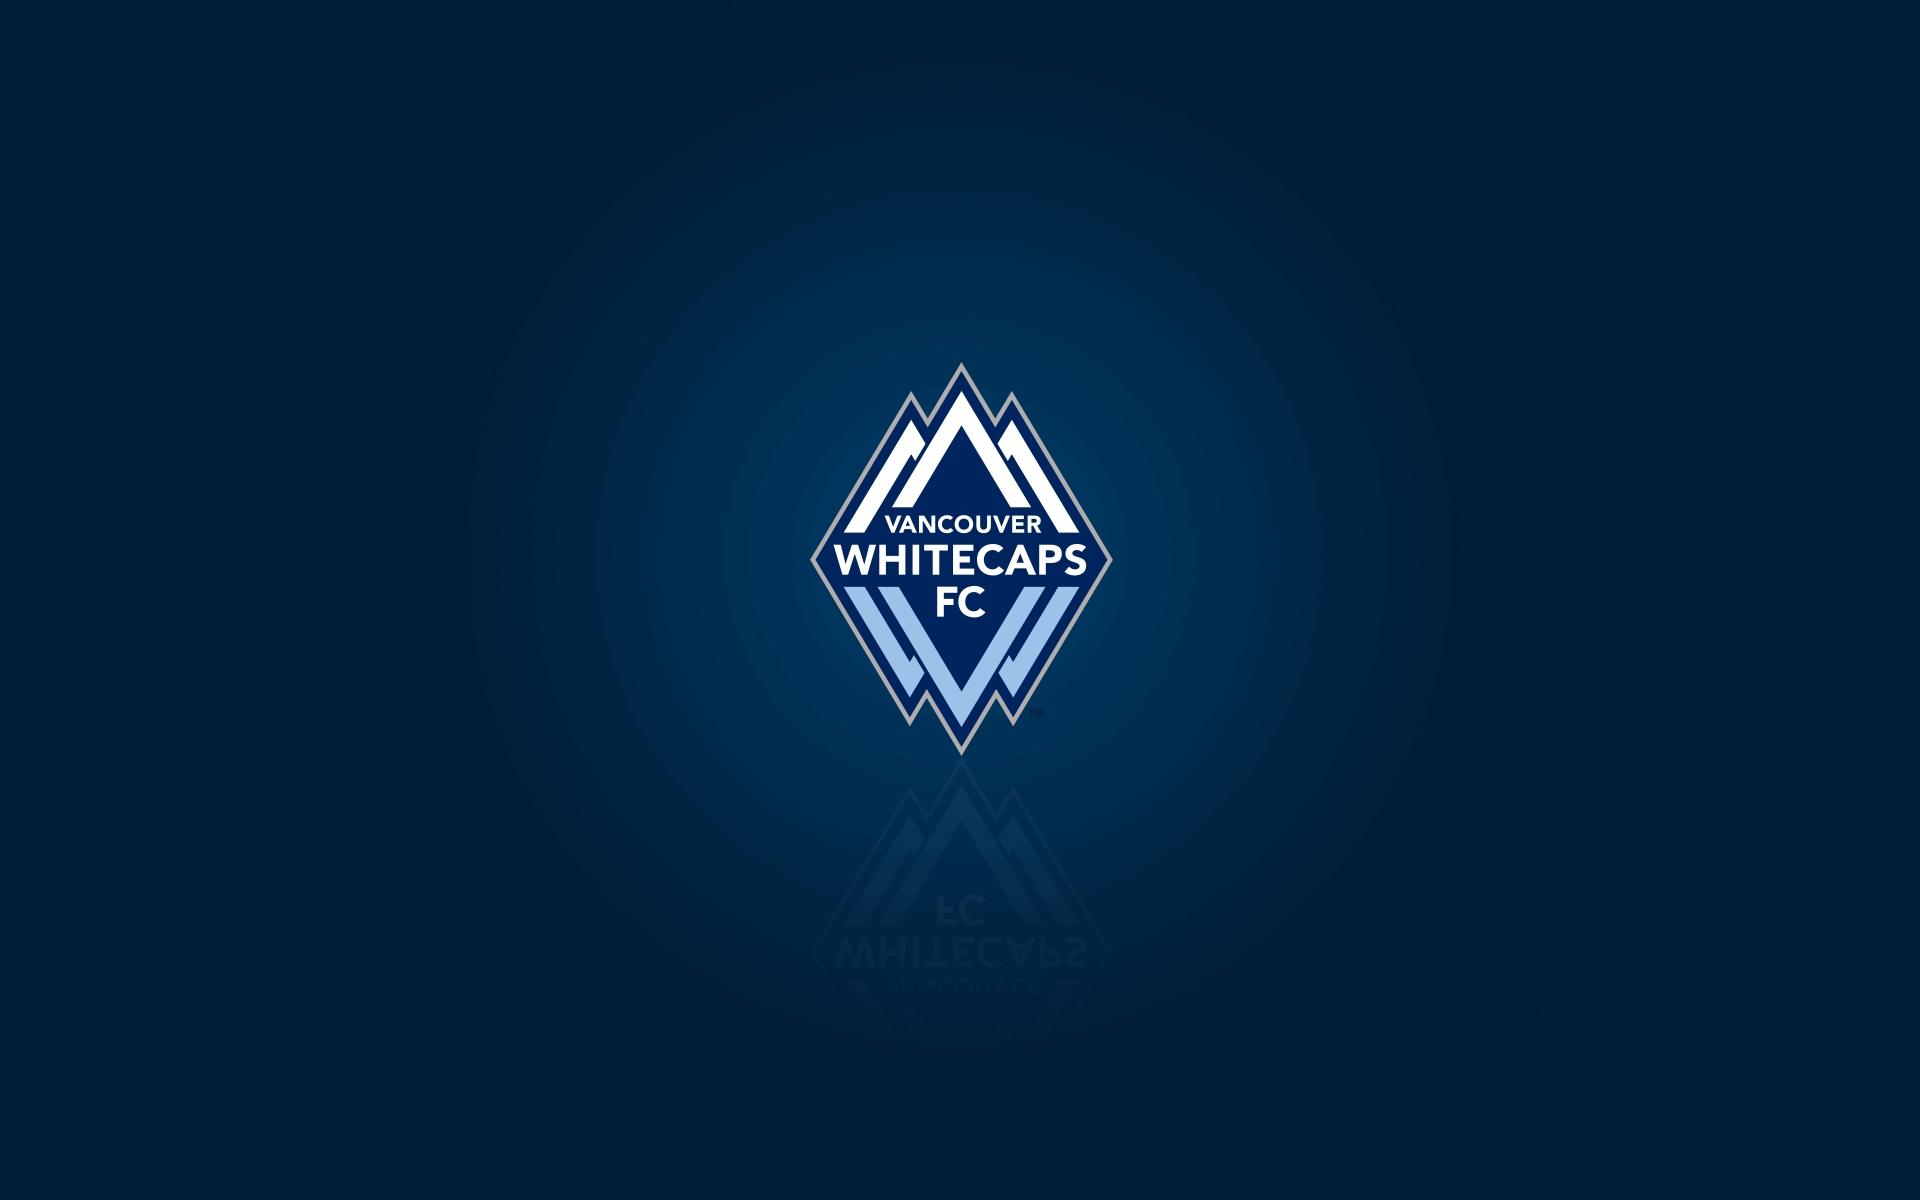 Vancouver Whitecaps FC HD Wallpaper Background Image 1920x1200 1920x1200